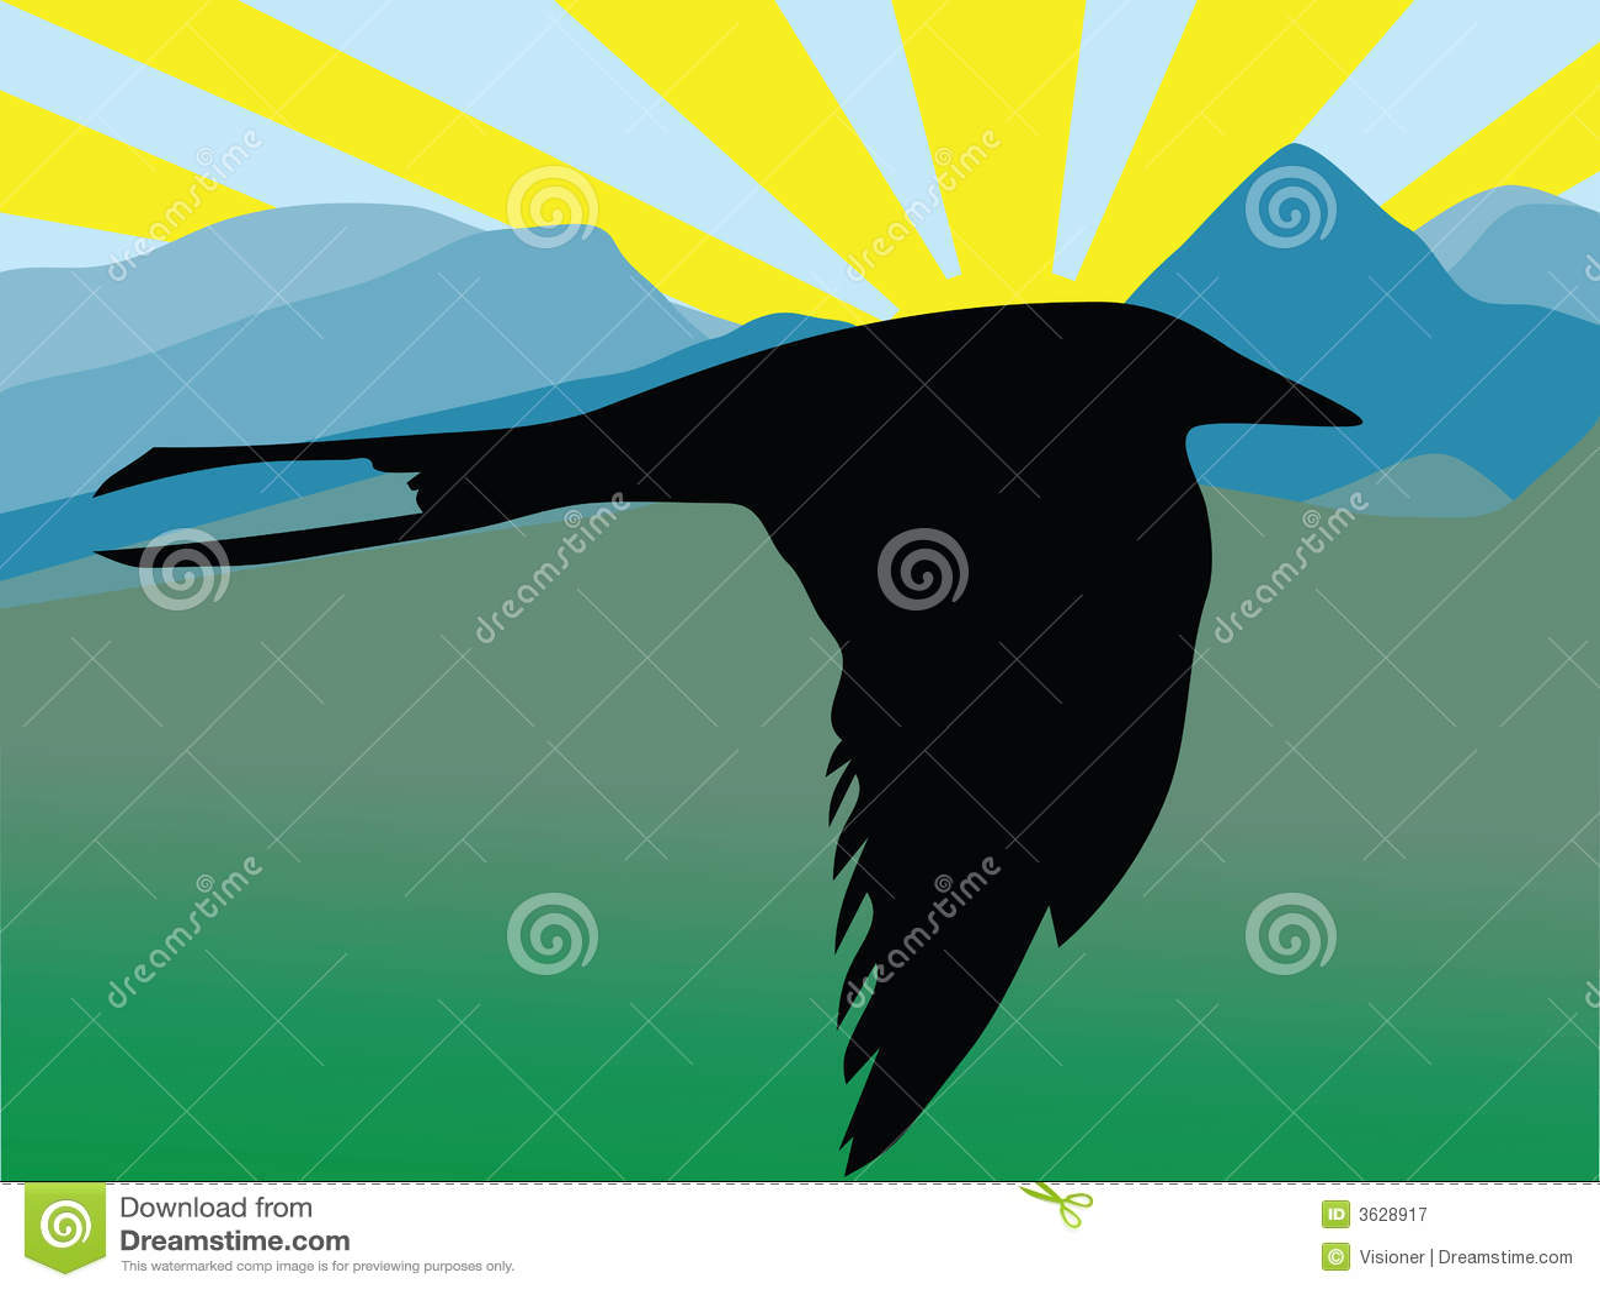 Royalty Free Stock Photography Bird Flying Image3628917